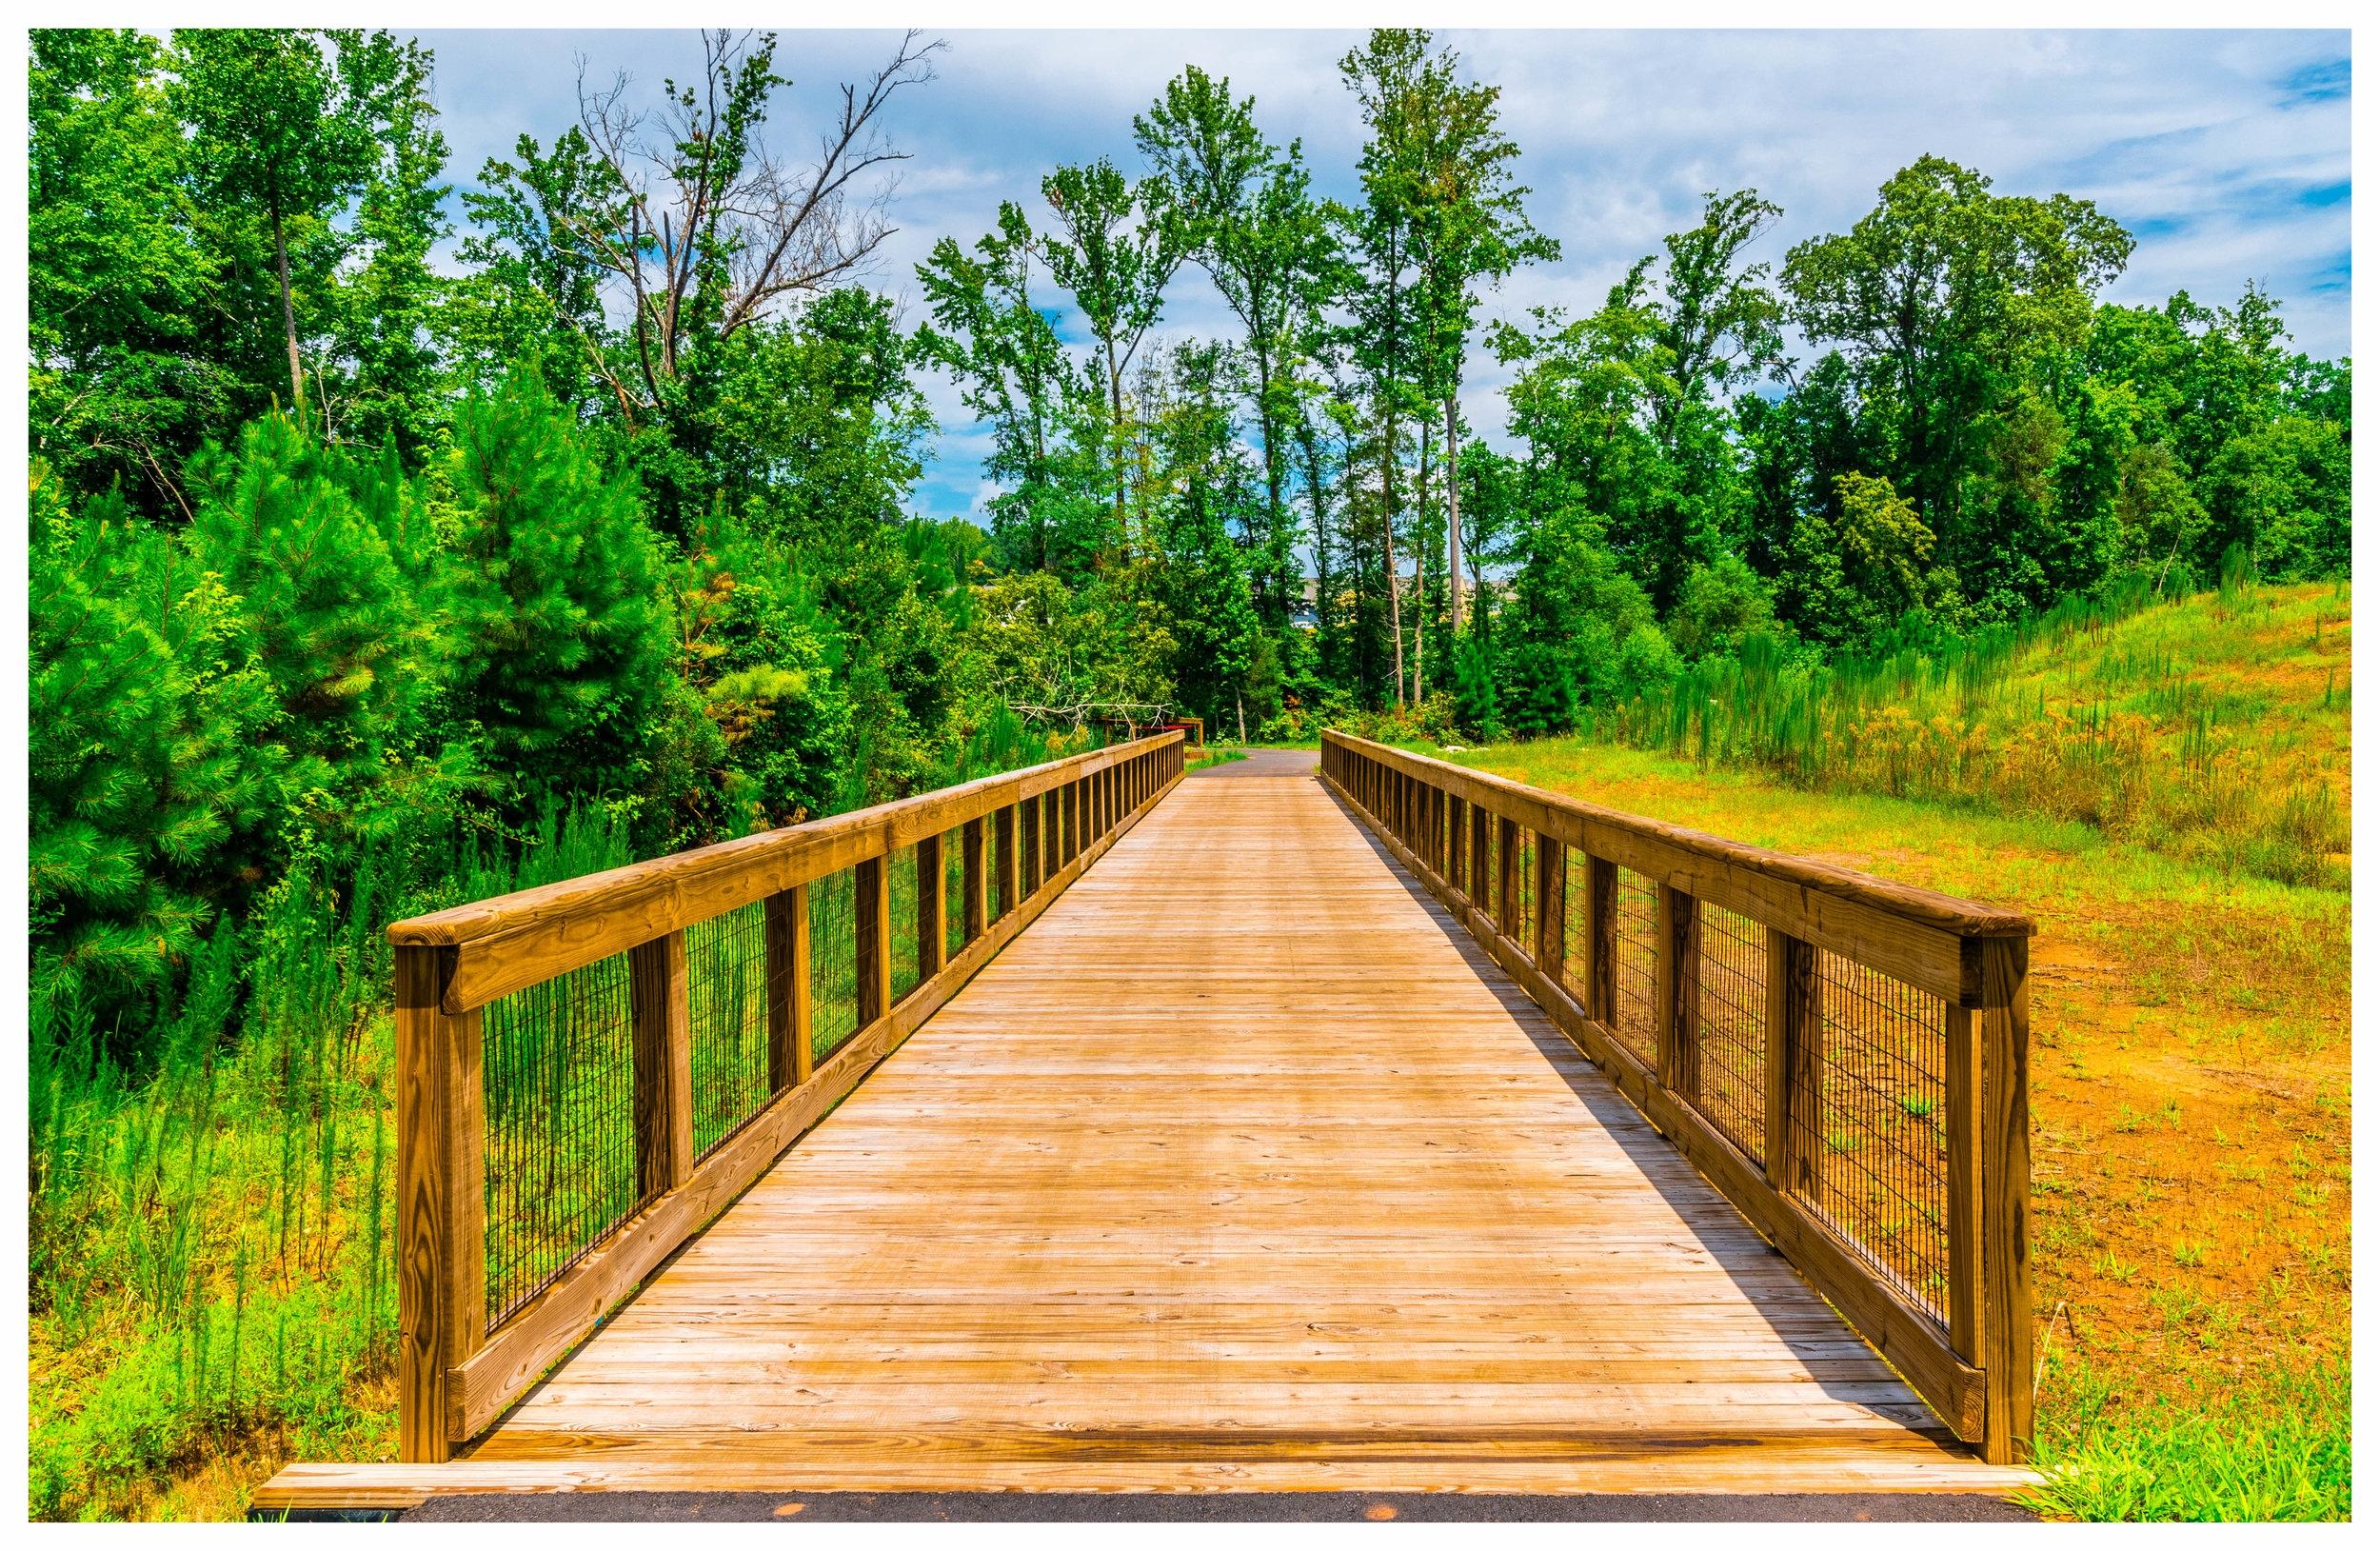 Golf Course Bridge Builder